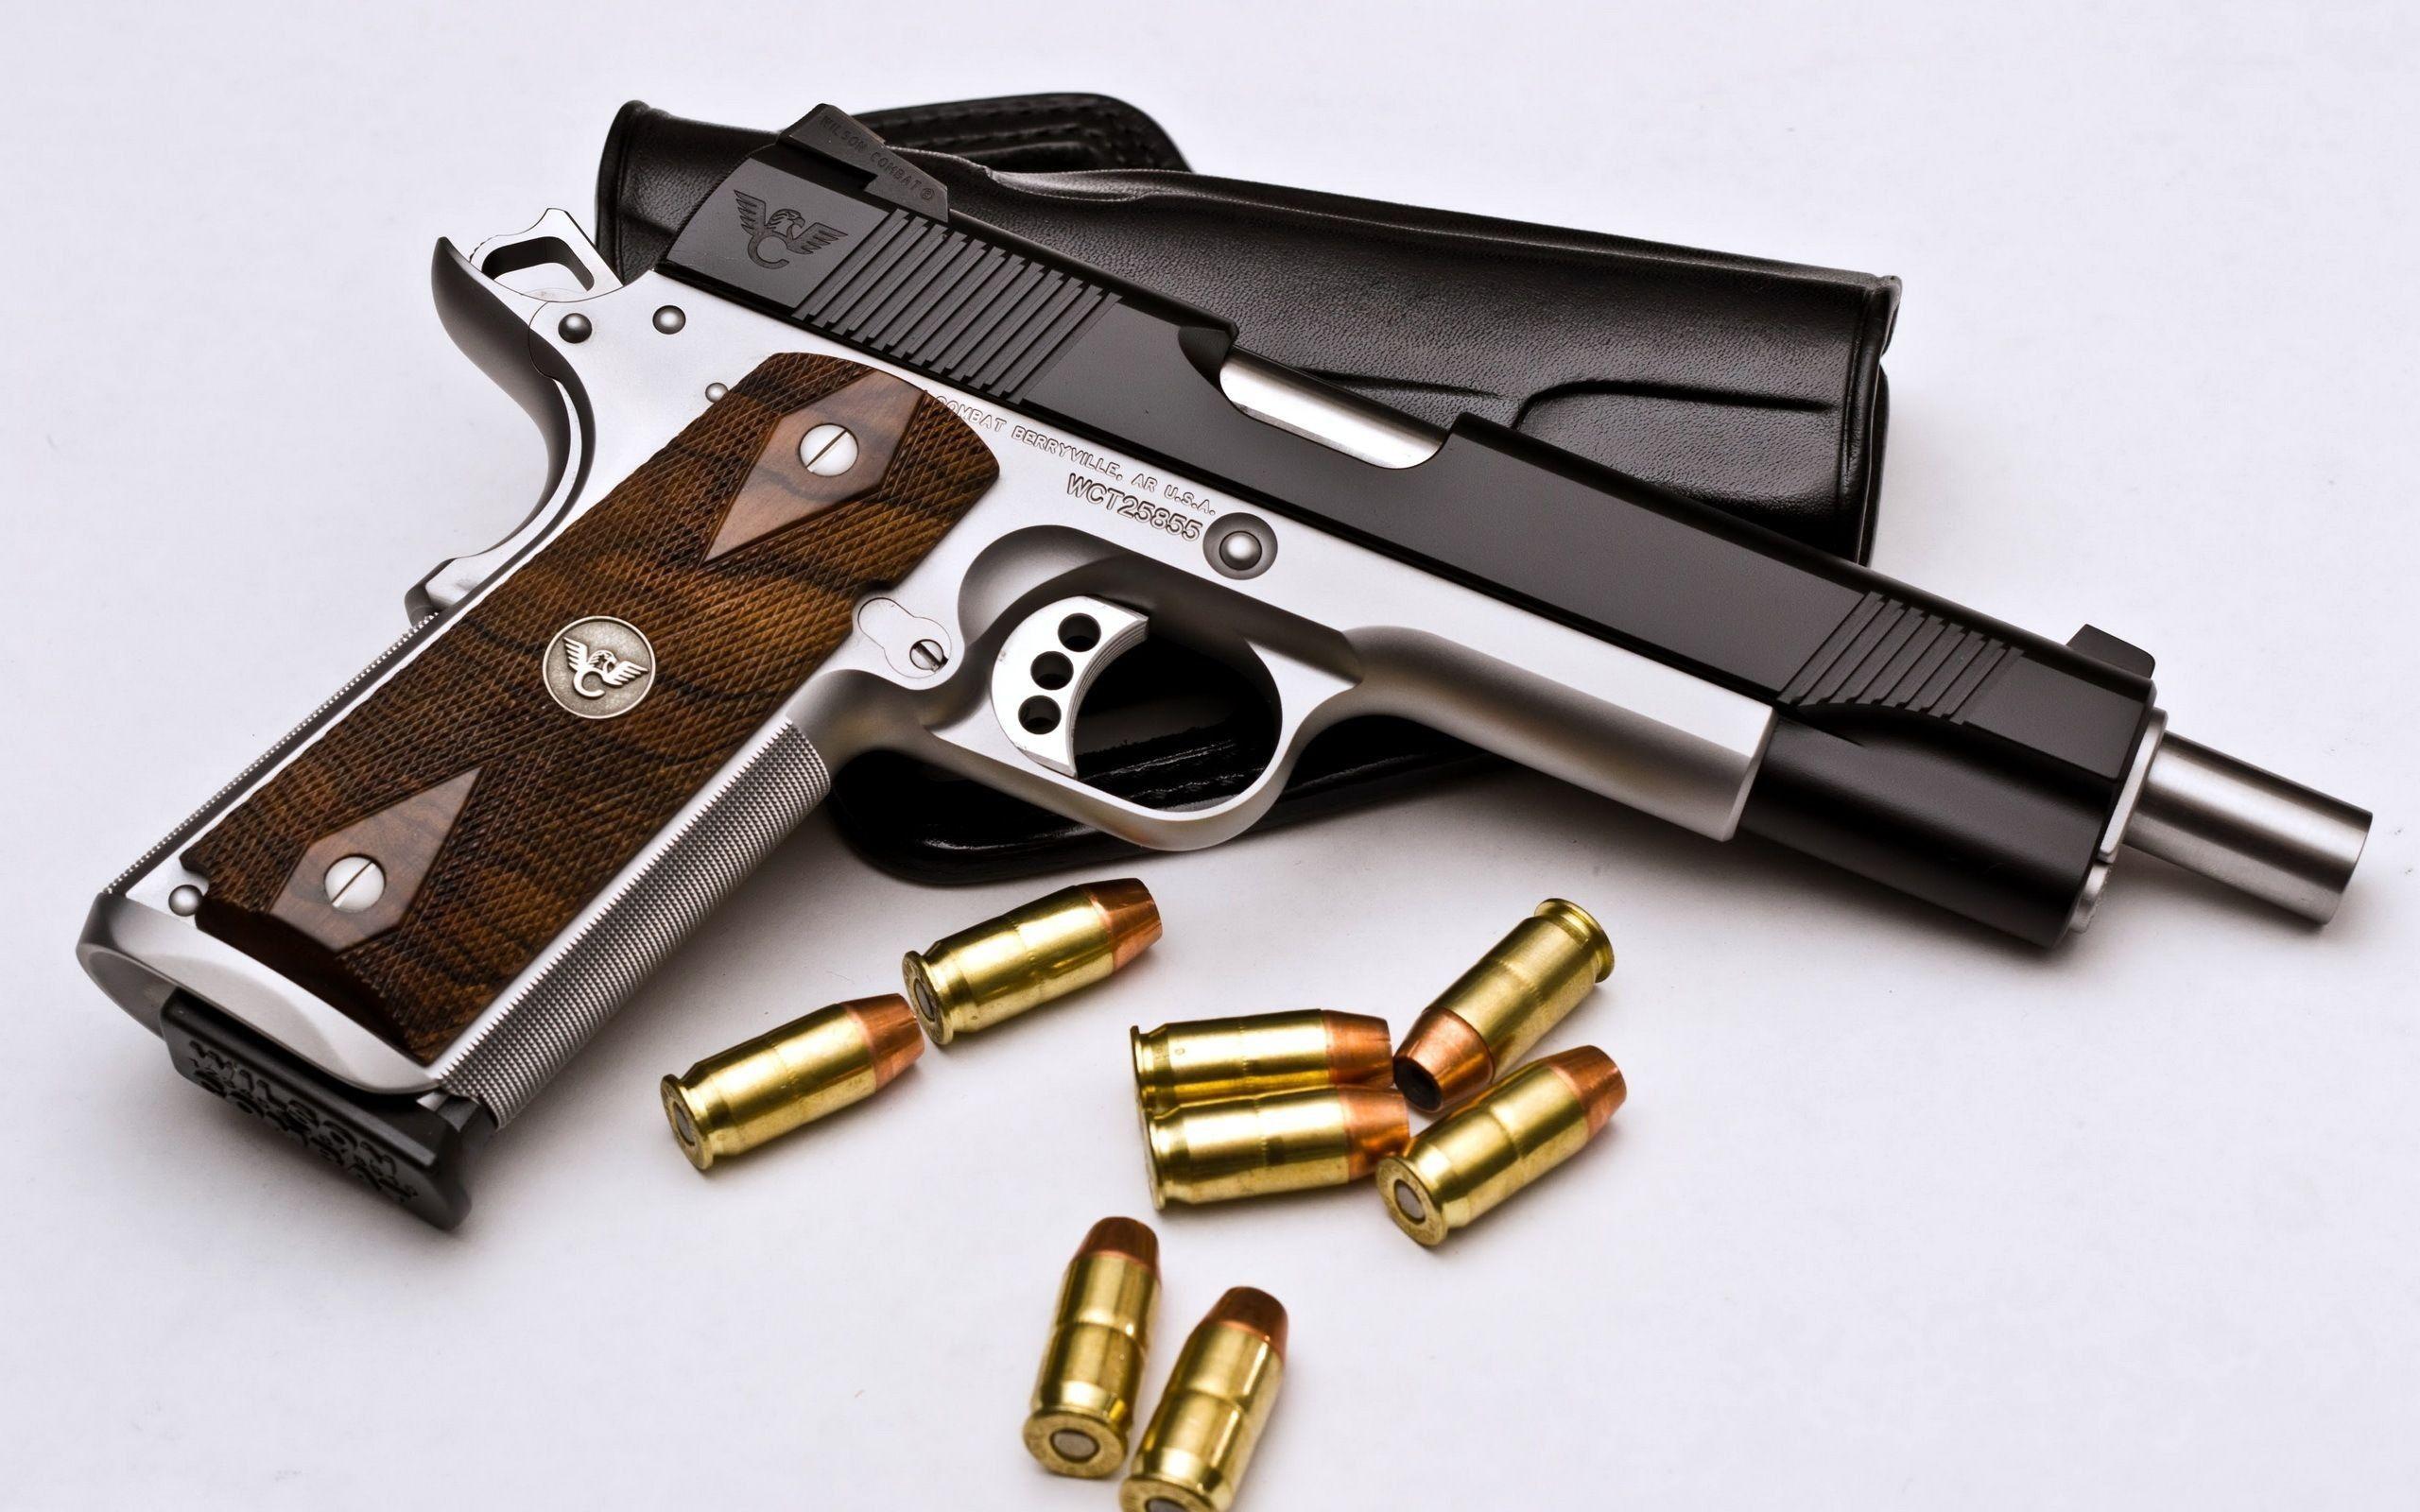 guns hd - Google Search | Hand guns, Guns, Guns wallpaper